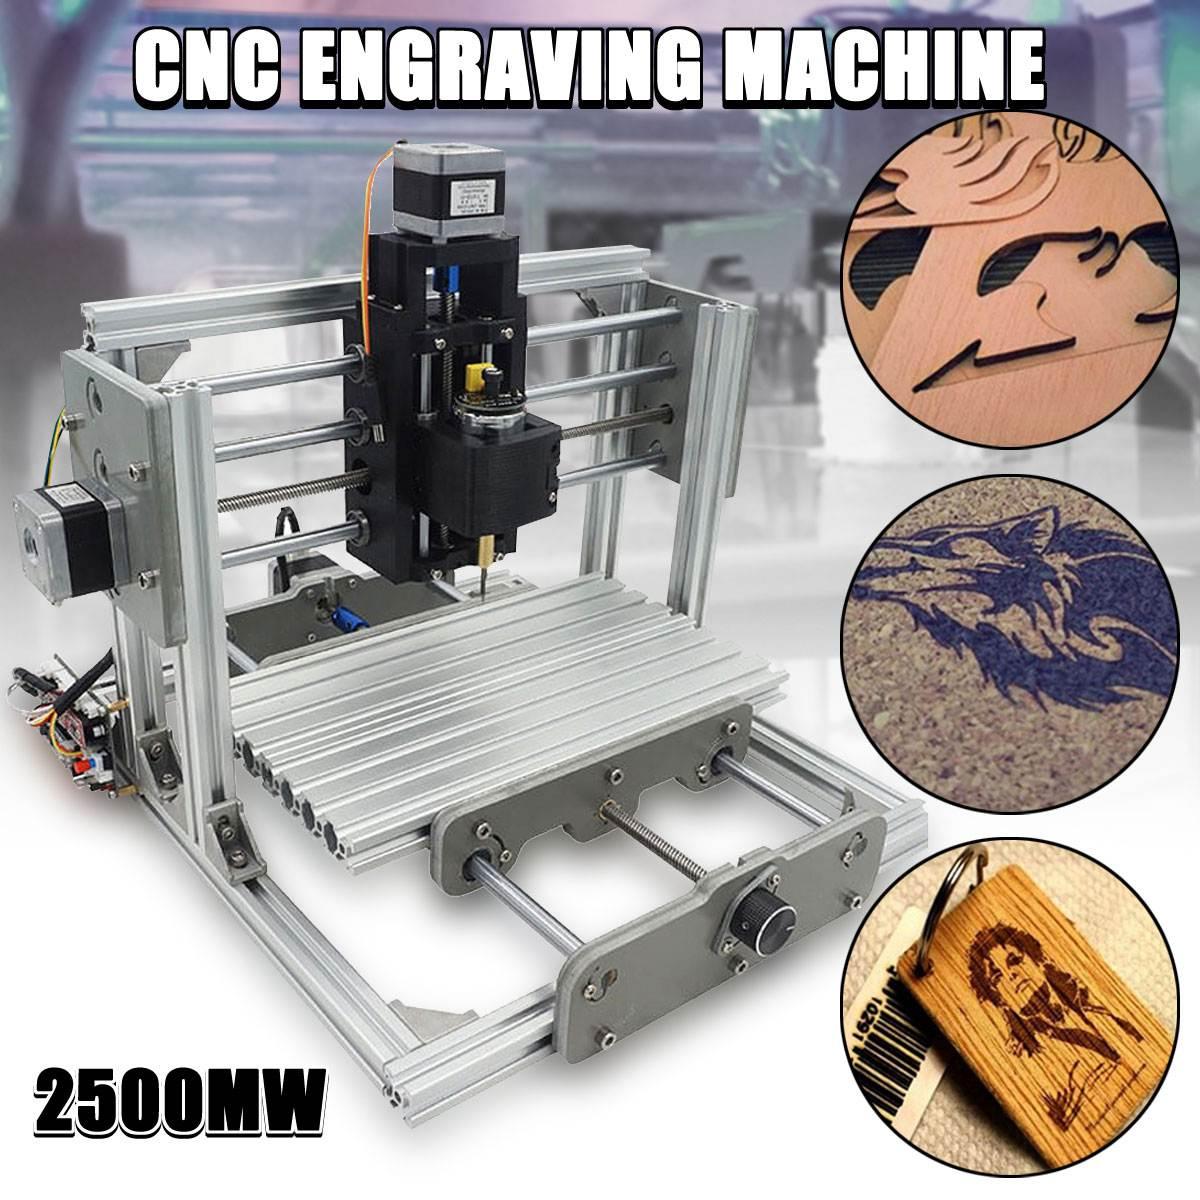 DC 12V 2500MW 3 Axis Mini DIY Desktop CNC Laser Engraver Engraving Machine Milling Carving Cutter Wood Router 0.04MM+ T8 Screws